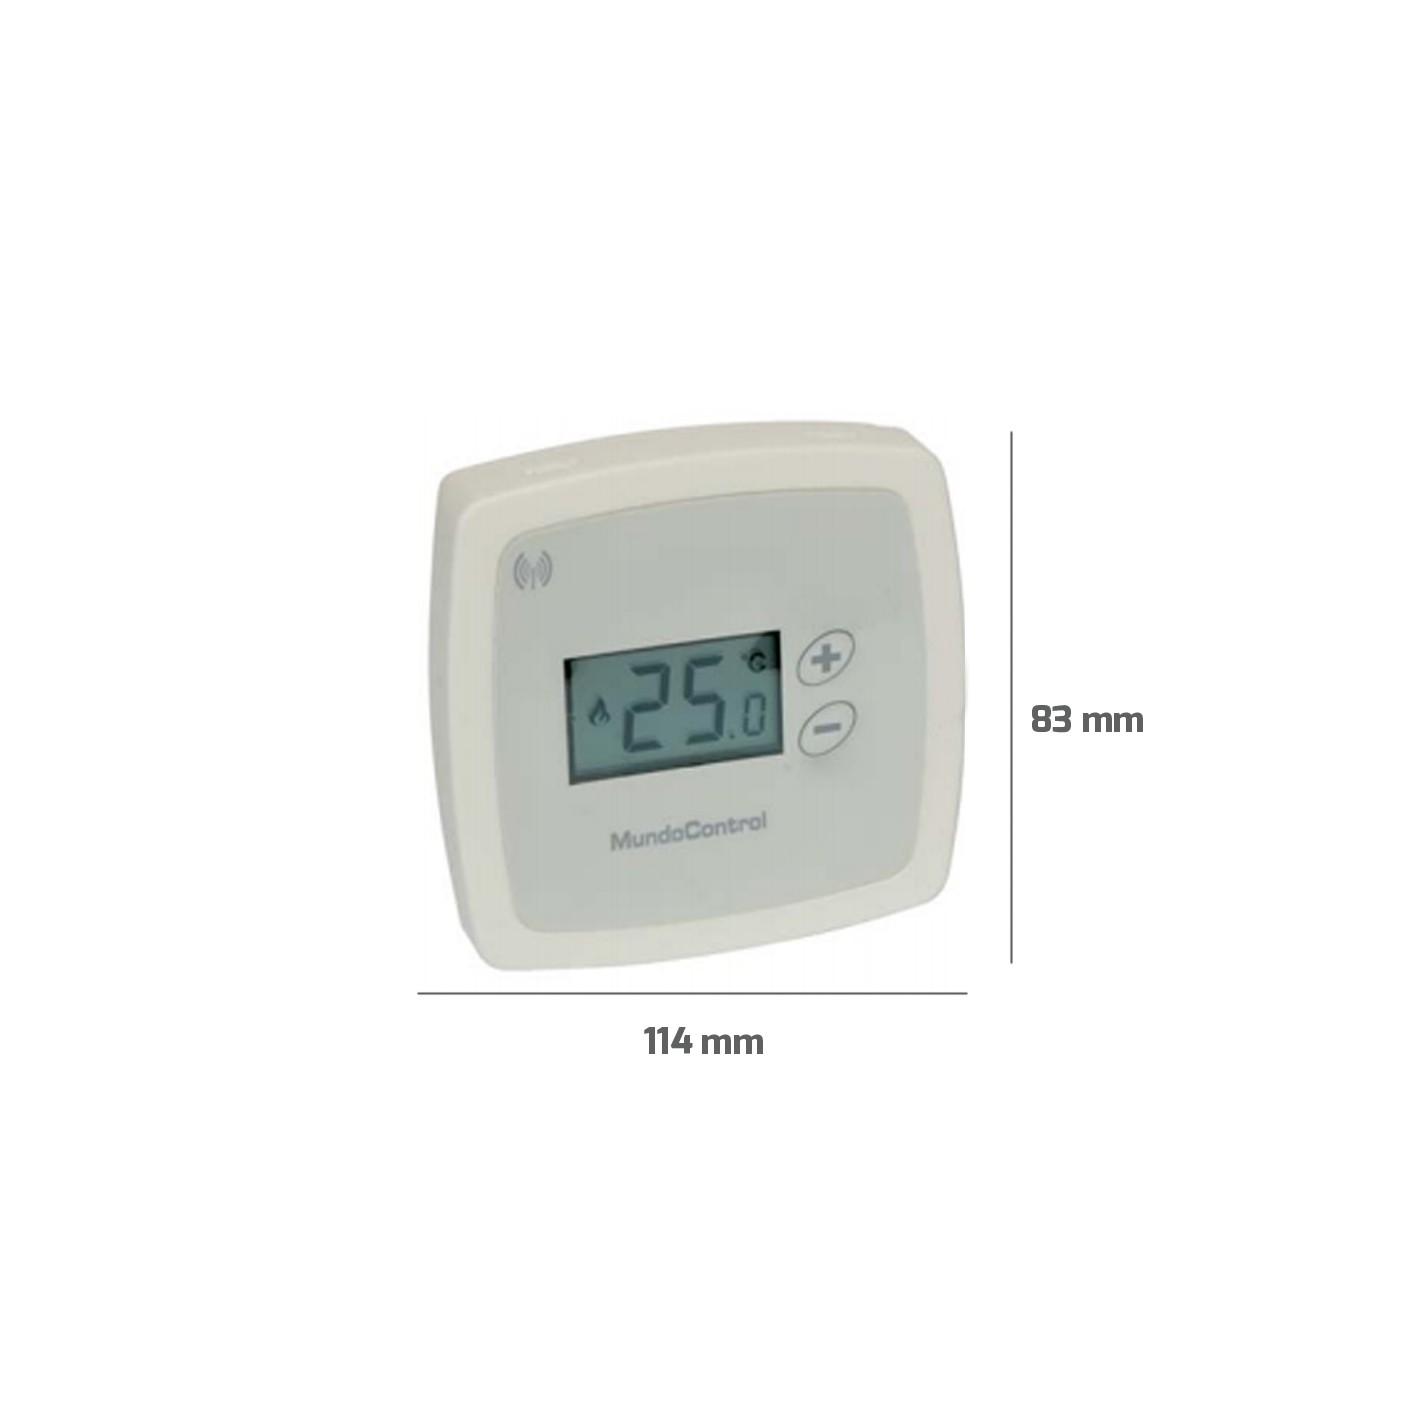 Termostato ambiente v a radio mc 1rf alg sistemas - Termostato ambiente digital ...